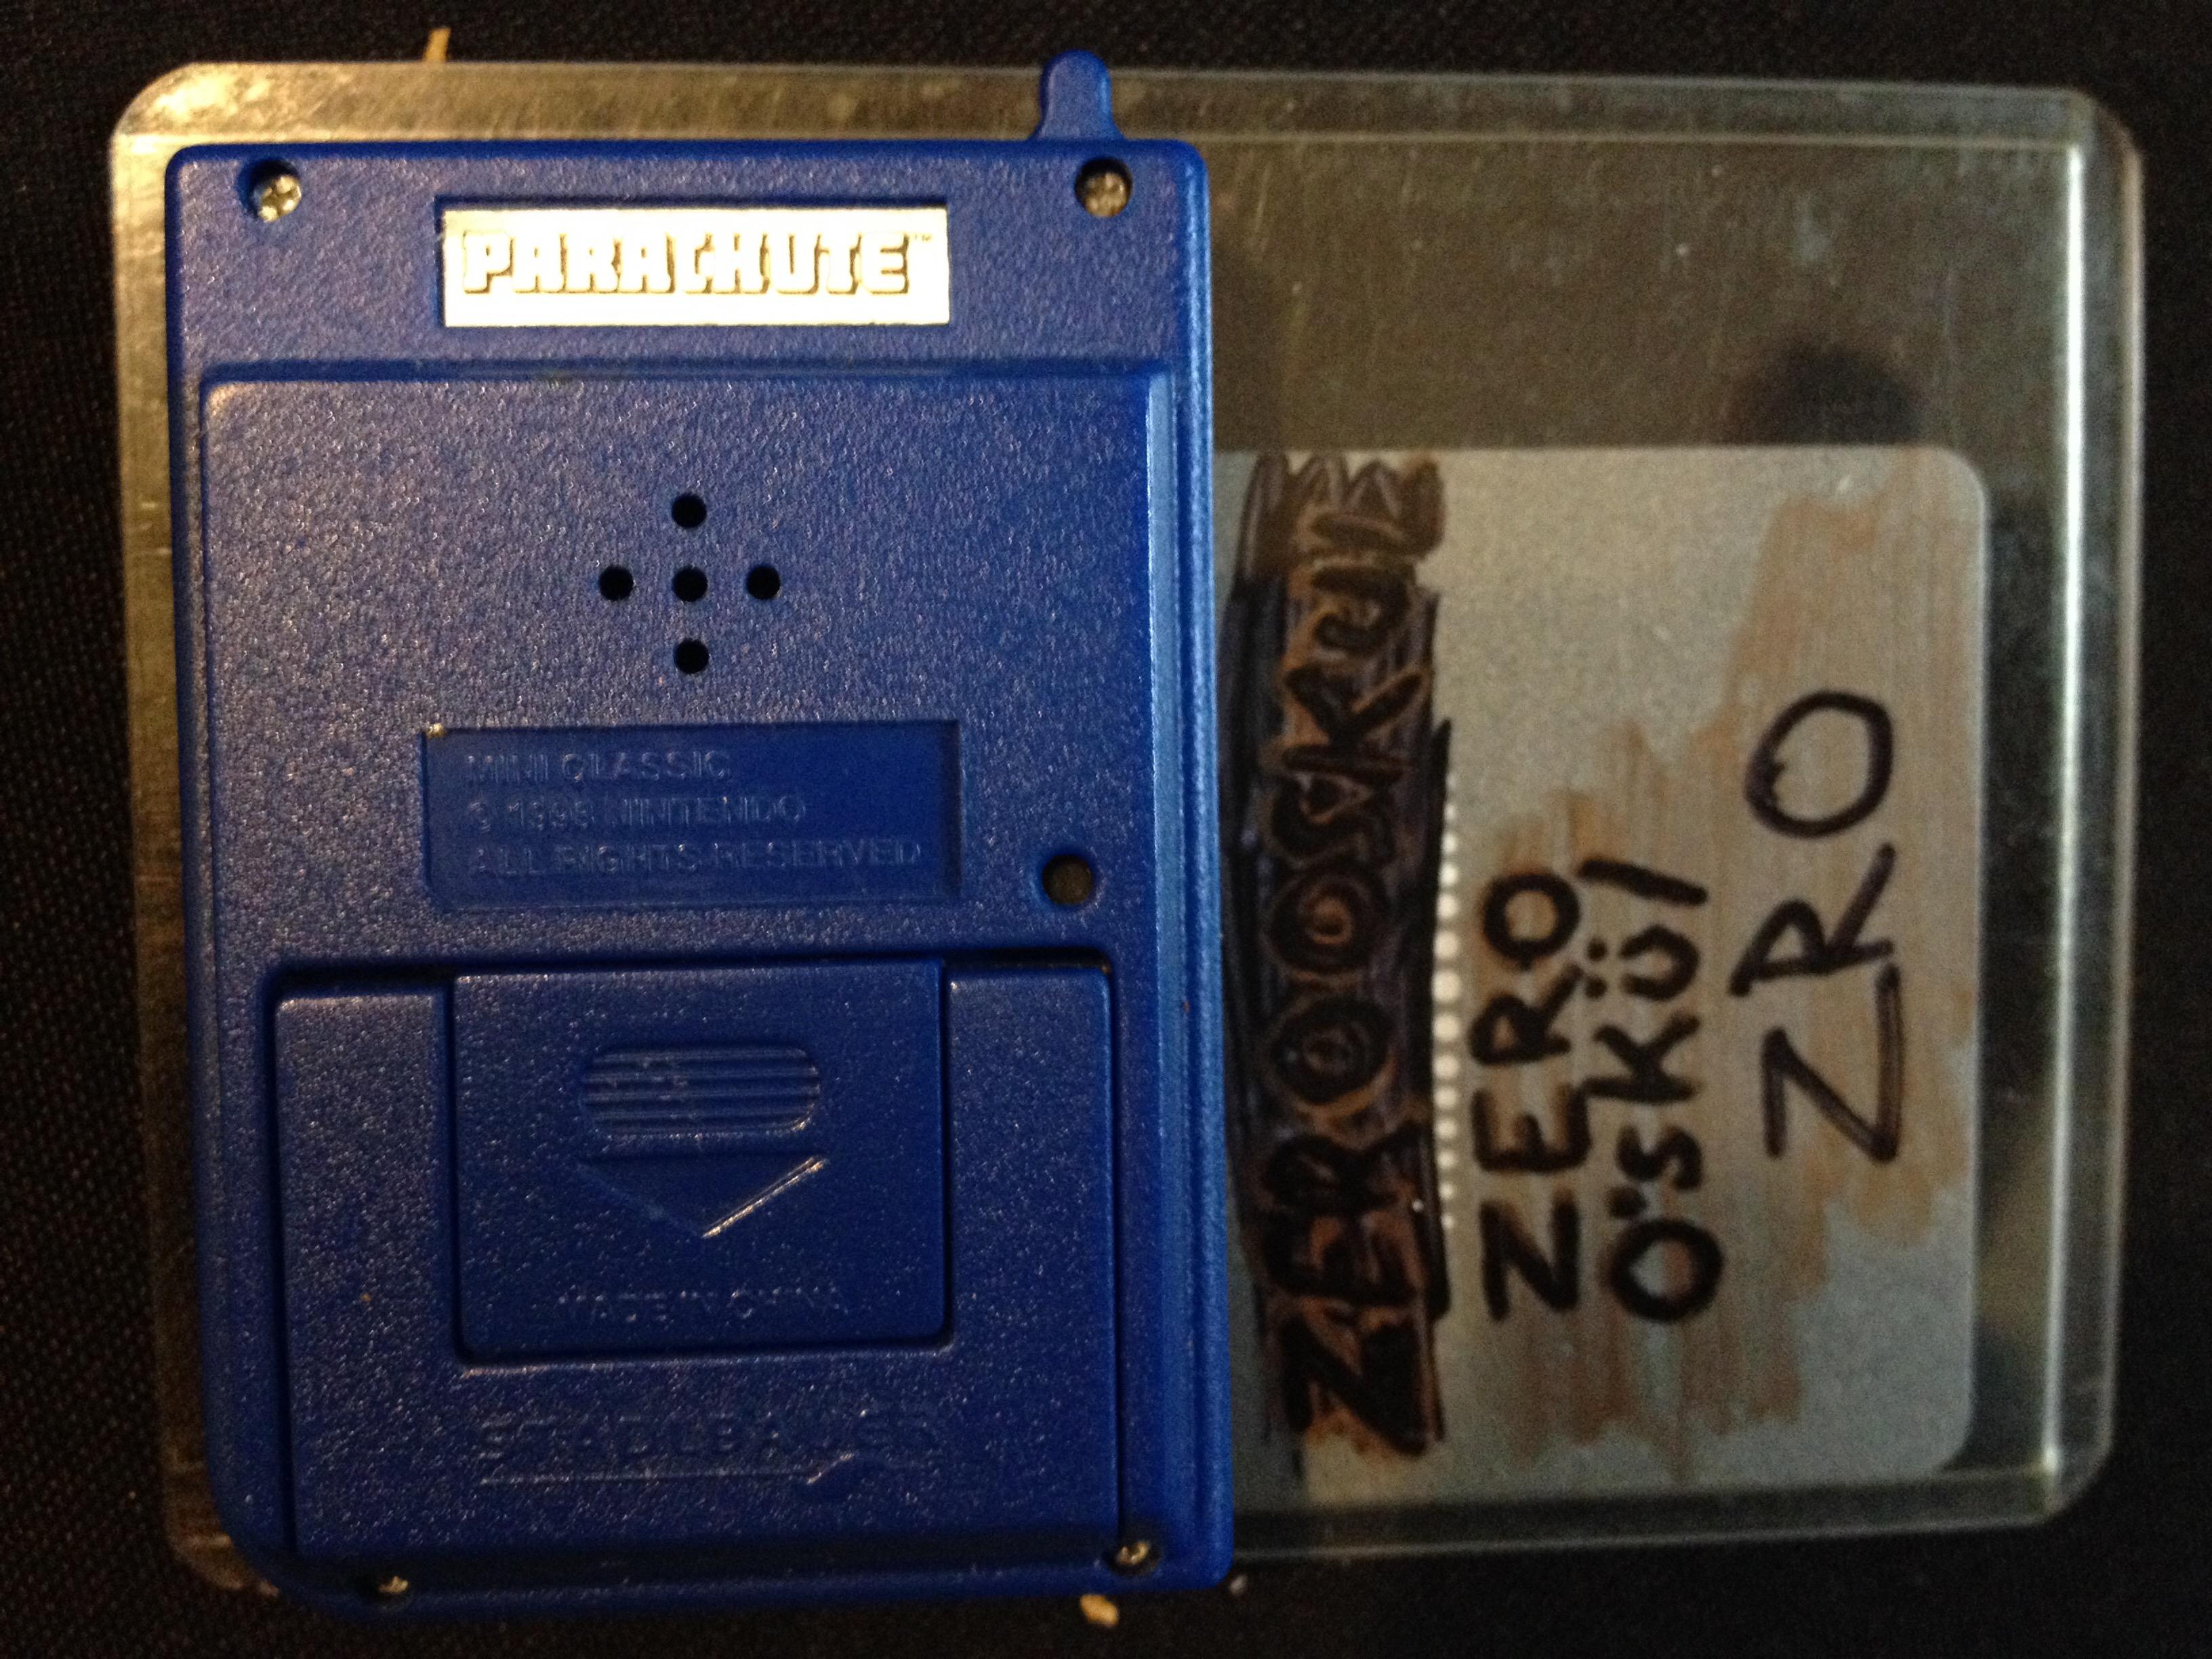 Nintendo Mini Classics: Parachute [Game A] 999 points